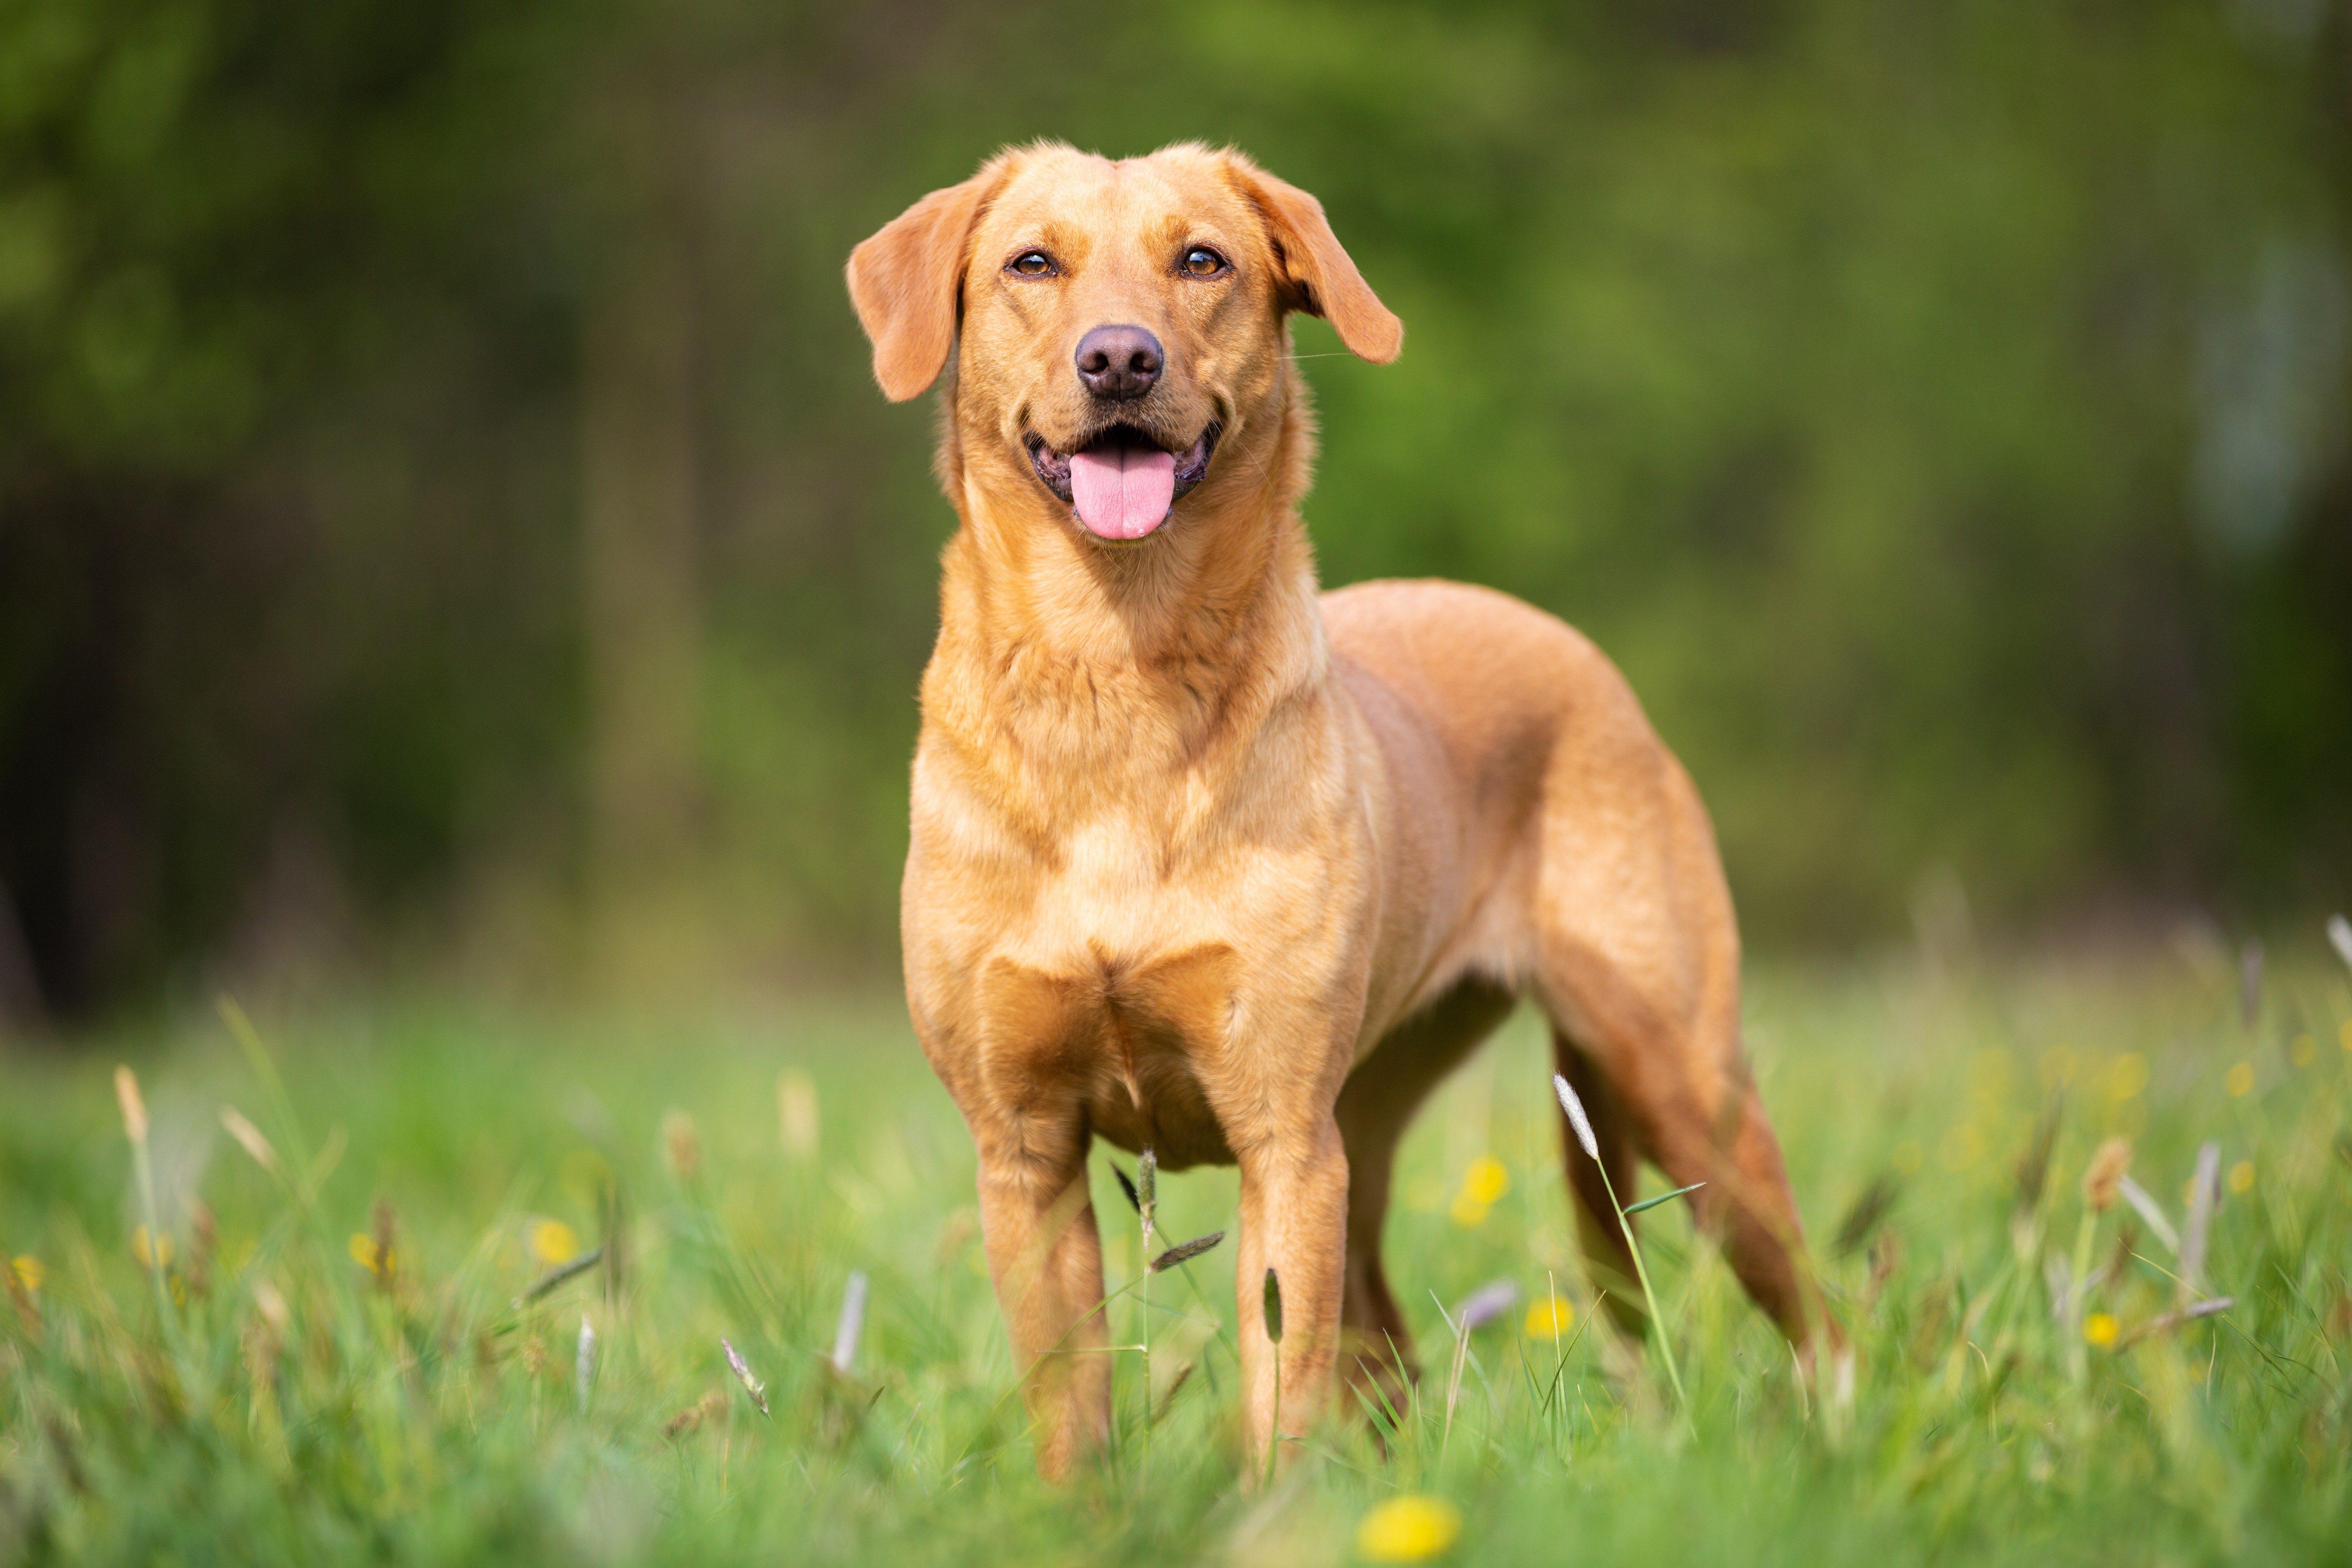 Pure breed Labrador Retriever dog from working line